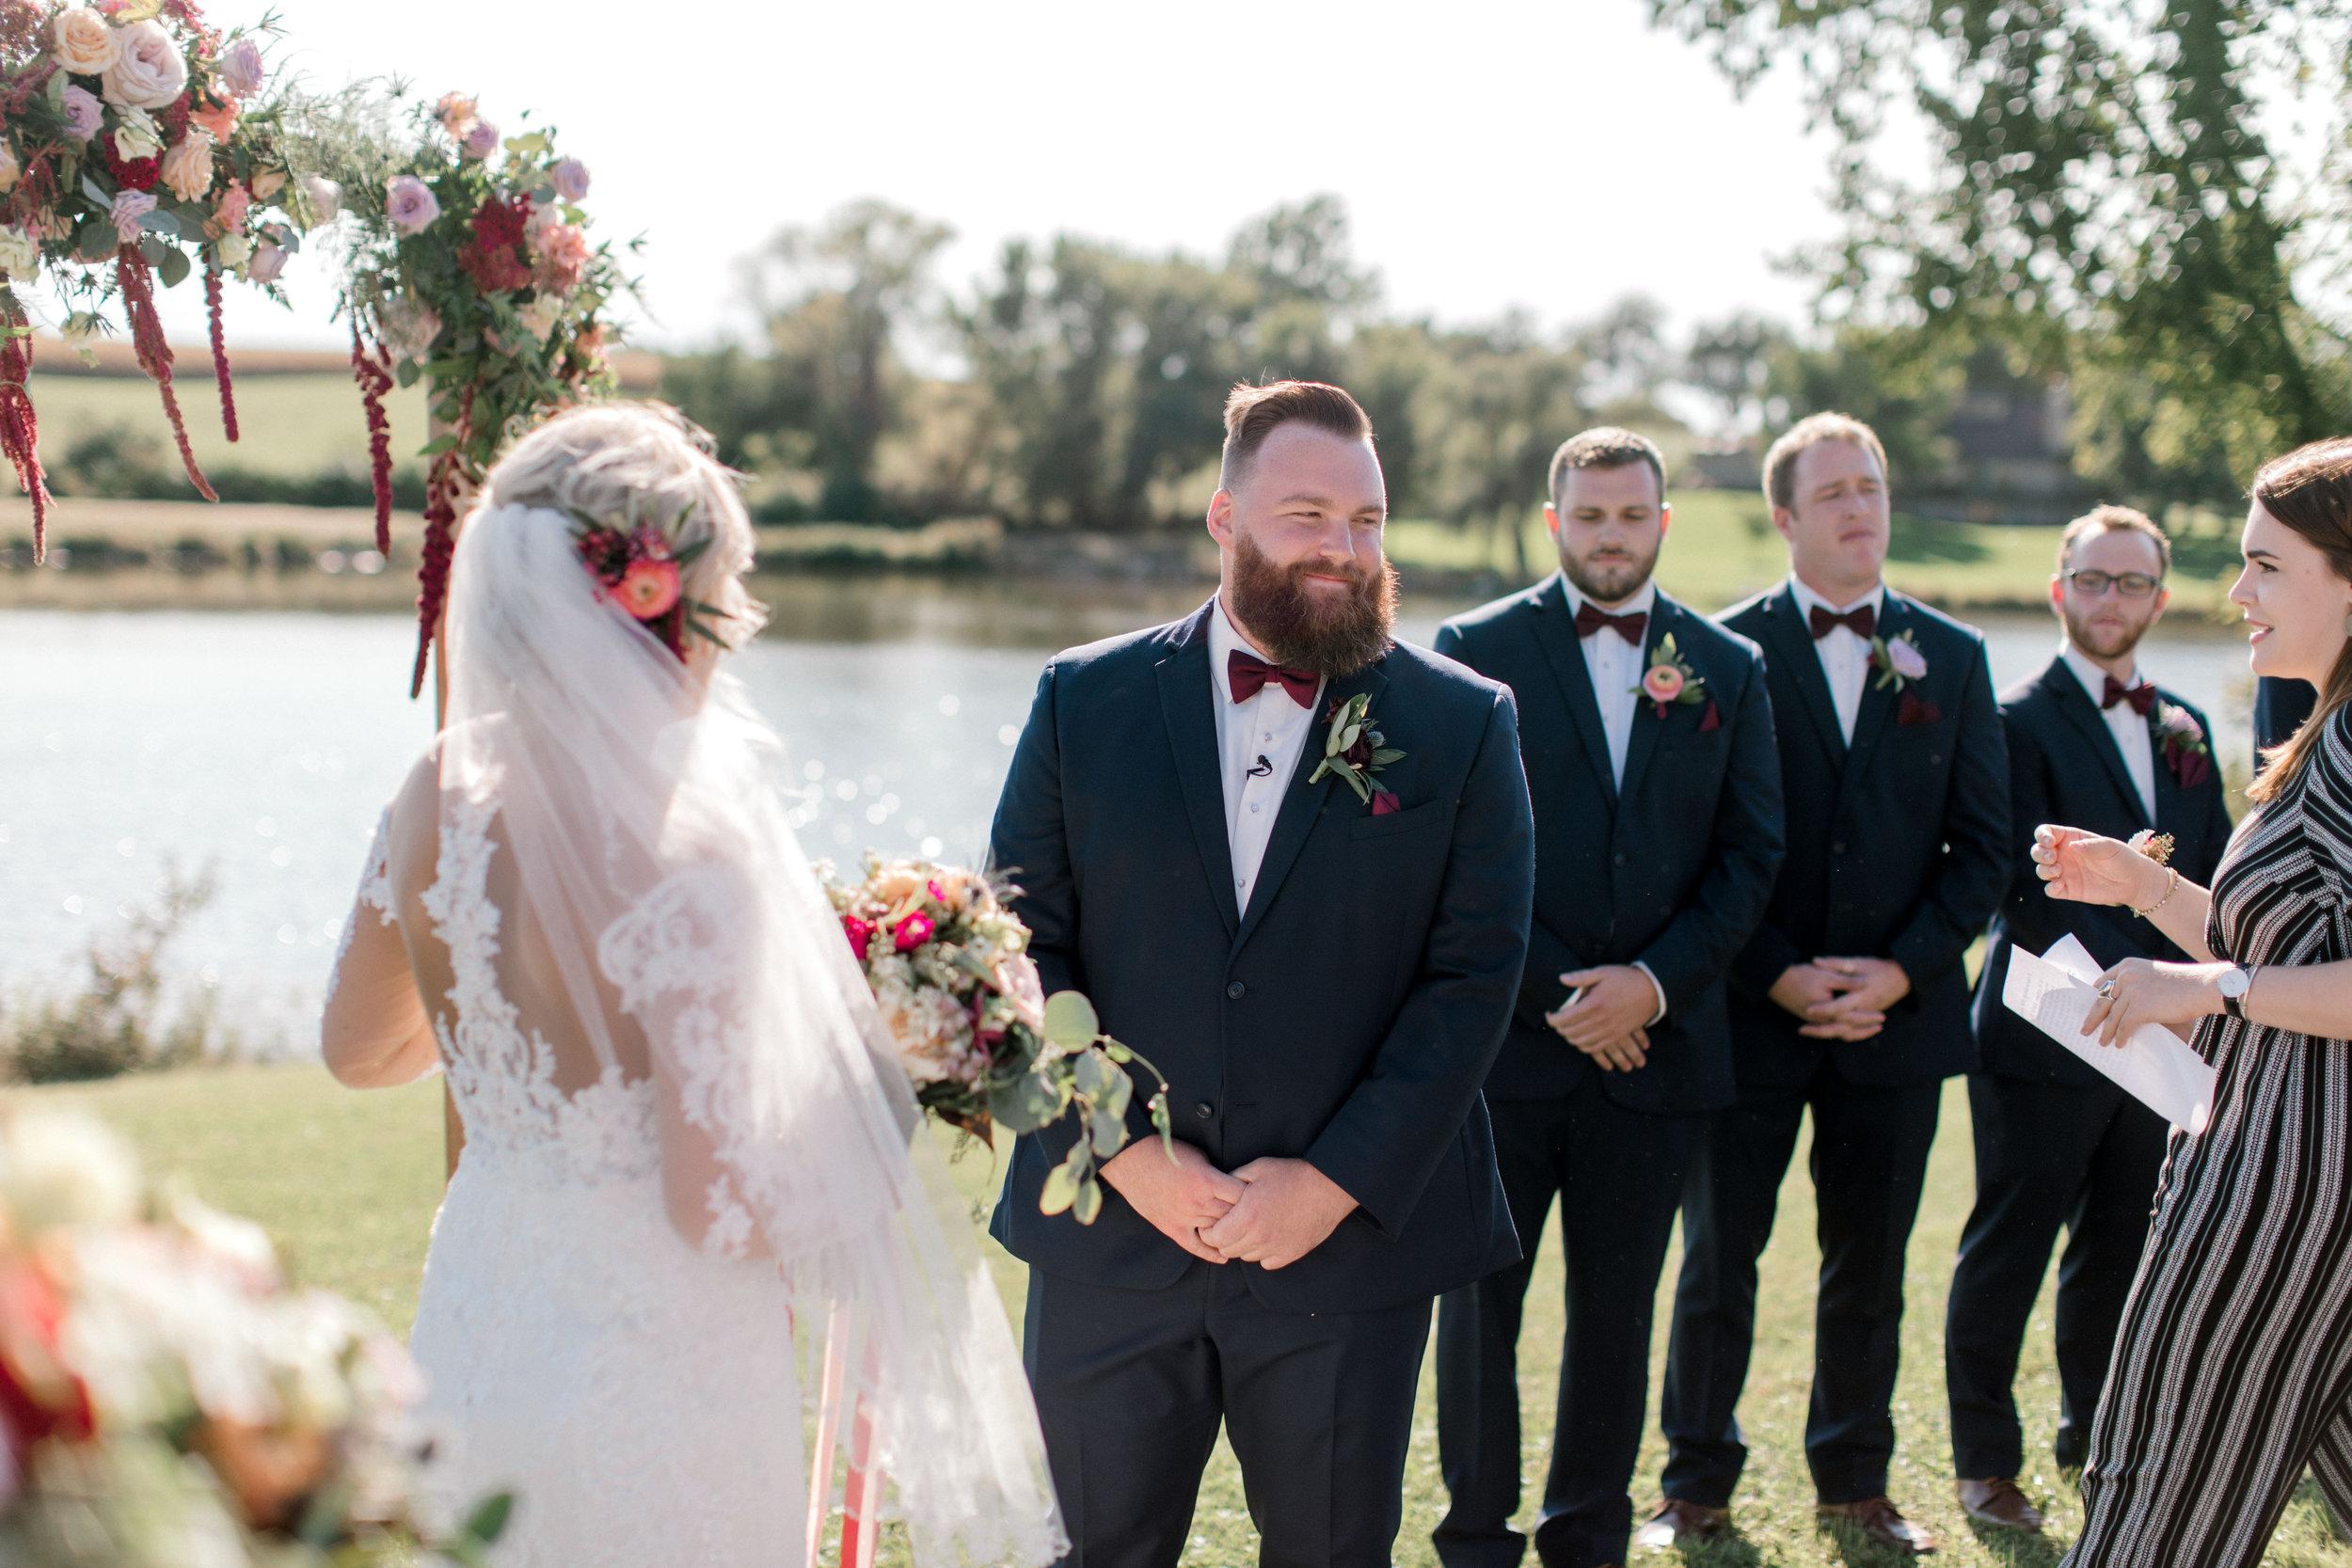 Ryan Alexa Married-Formals Ceremony-0155.jpg